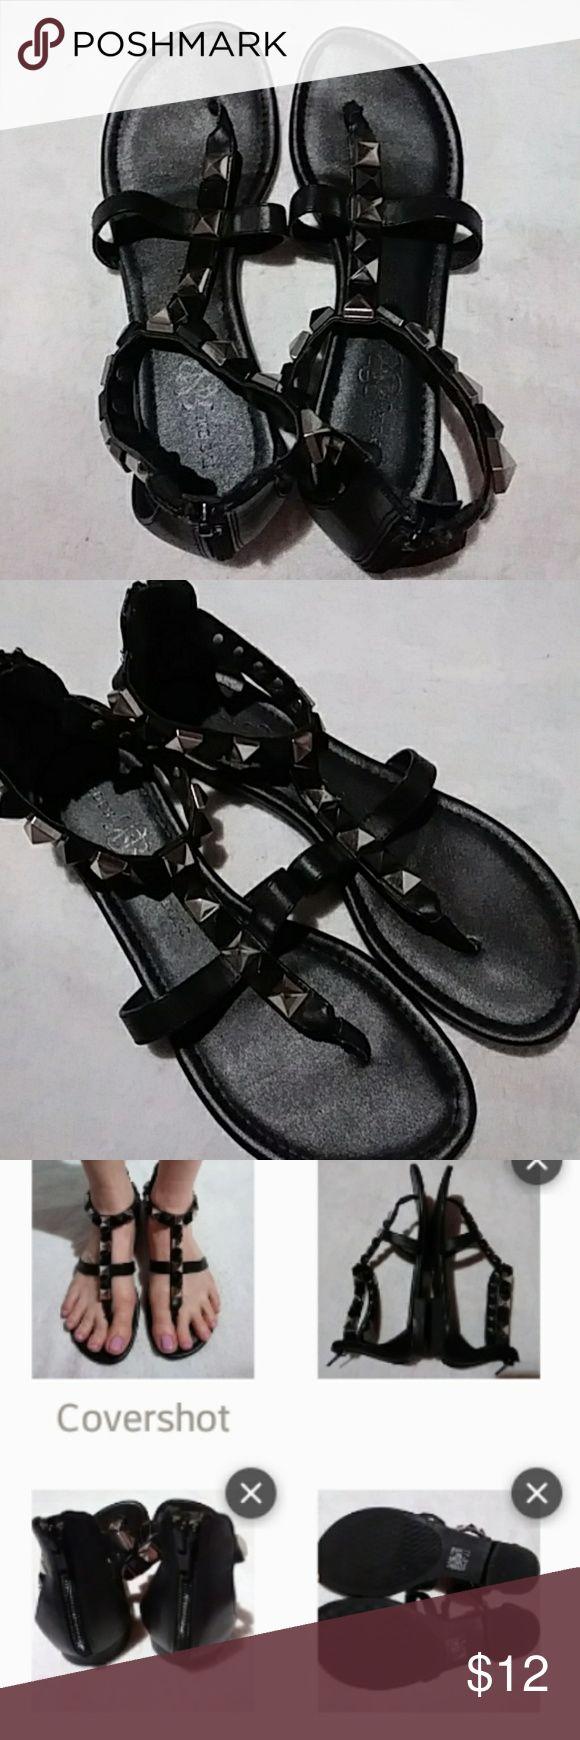 "Rock & Republic Studded Thongs ROCK & REPUBLIC Black & Silver Studded Thong Sandals Women's Size 8.5 Med Zips Up Back * 1/2"" Heel Man Made: Upper, Lining, Socklining & Outersole *EUC* Rock & Republic Shoes Sandals"